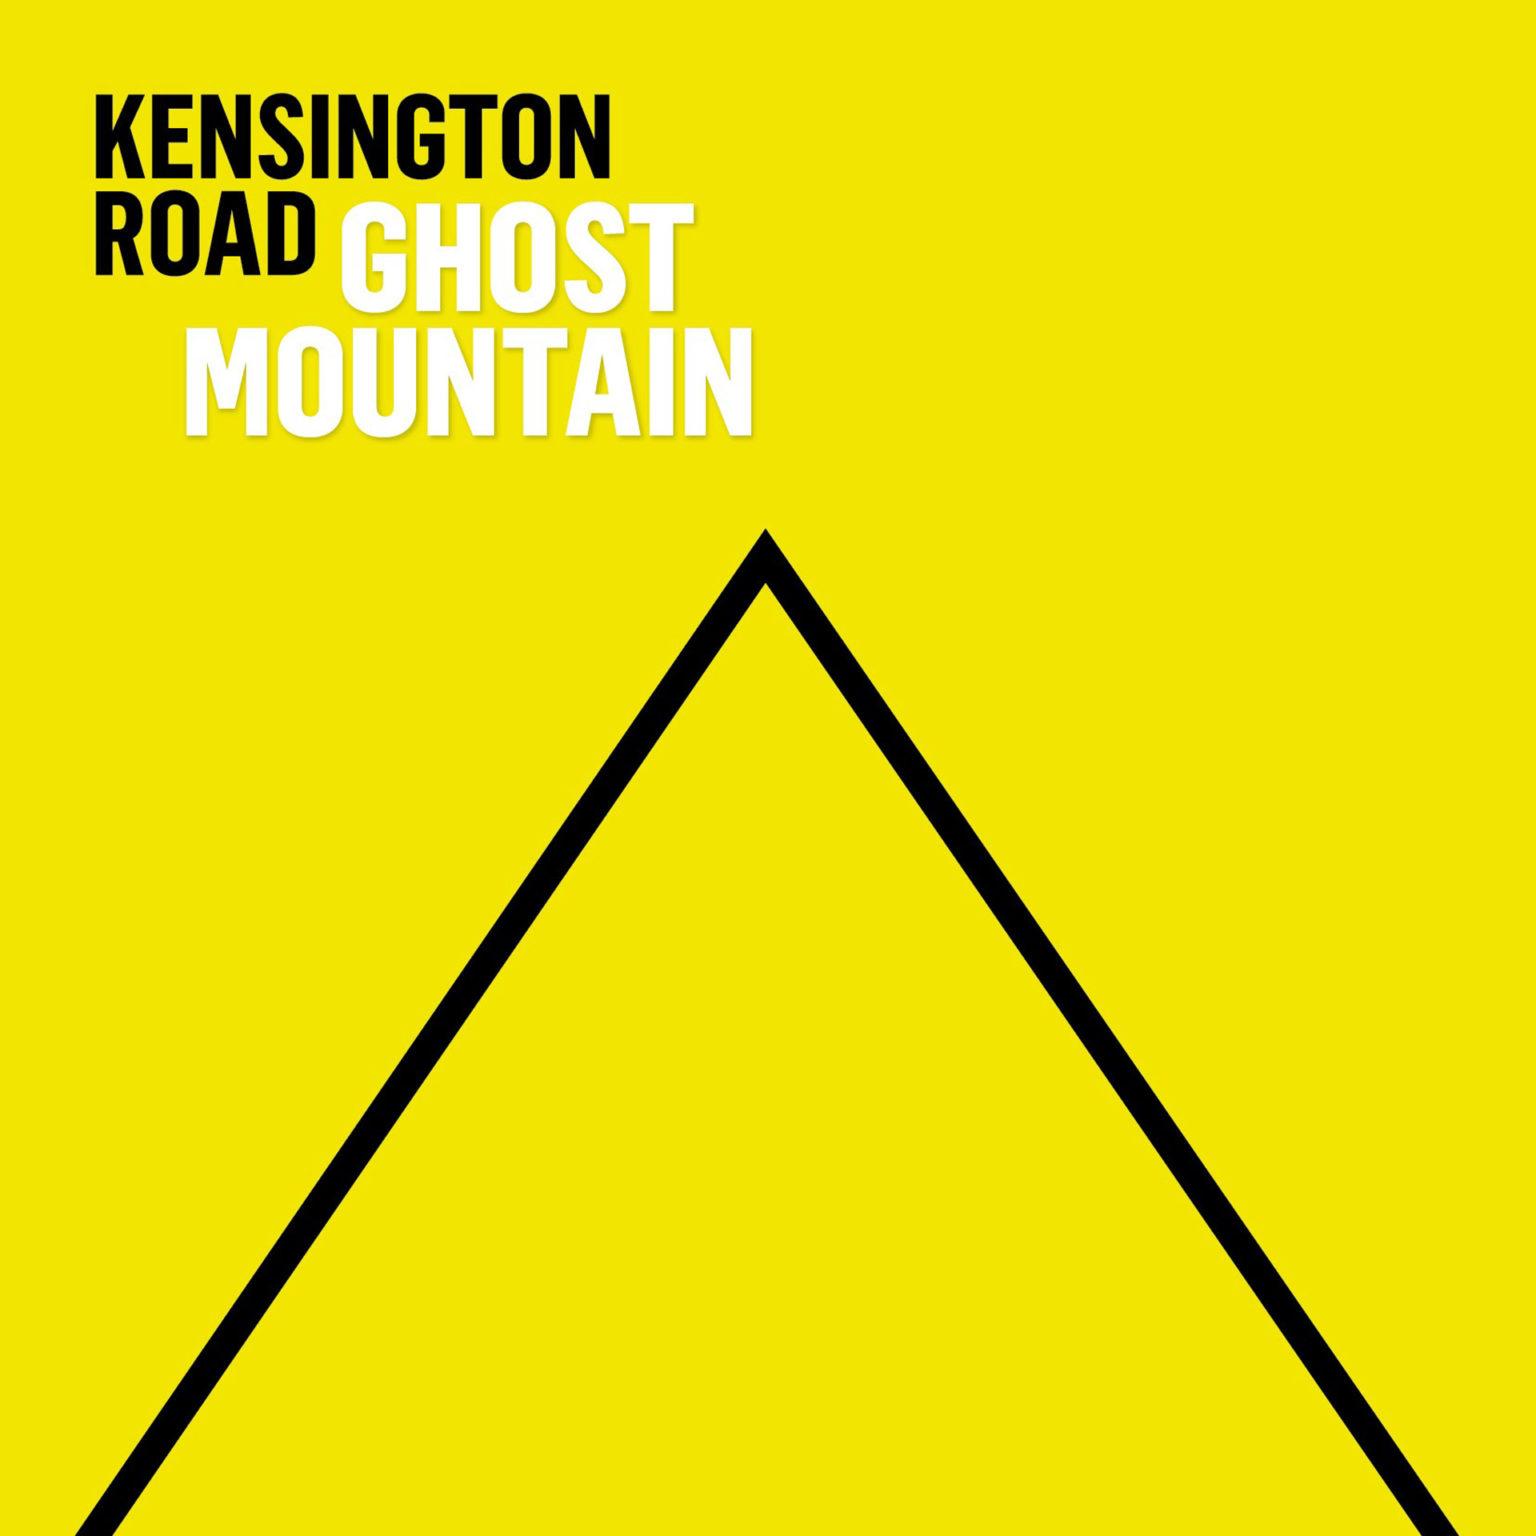 Kensington Road - Ghost Mountain Cover - s'läuft! Radio-Promotion